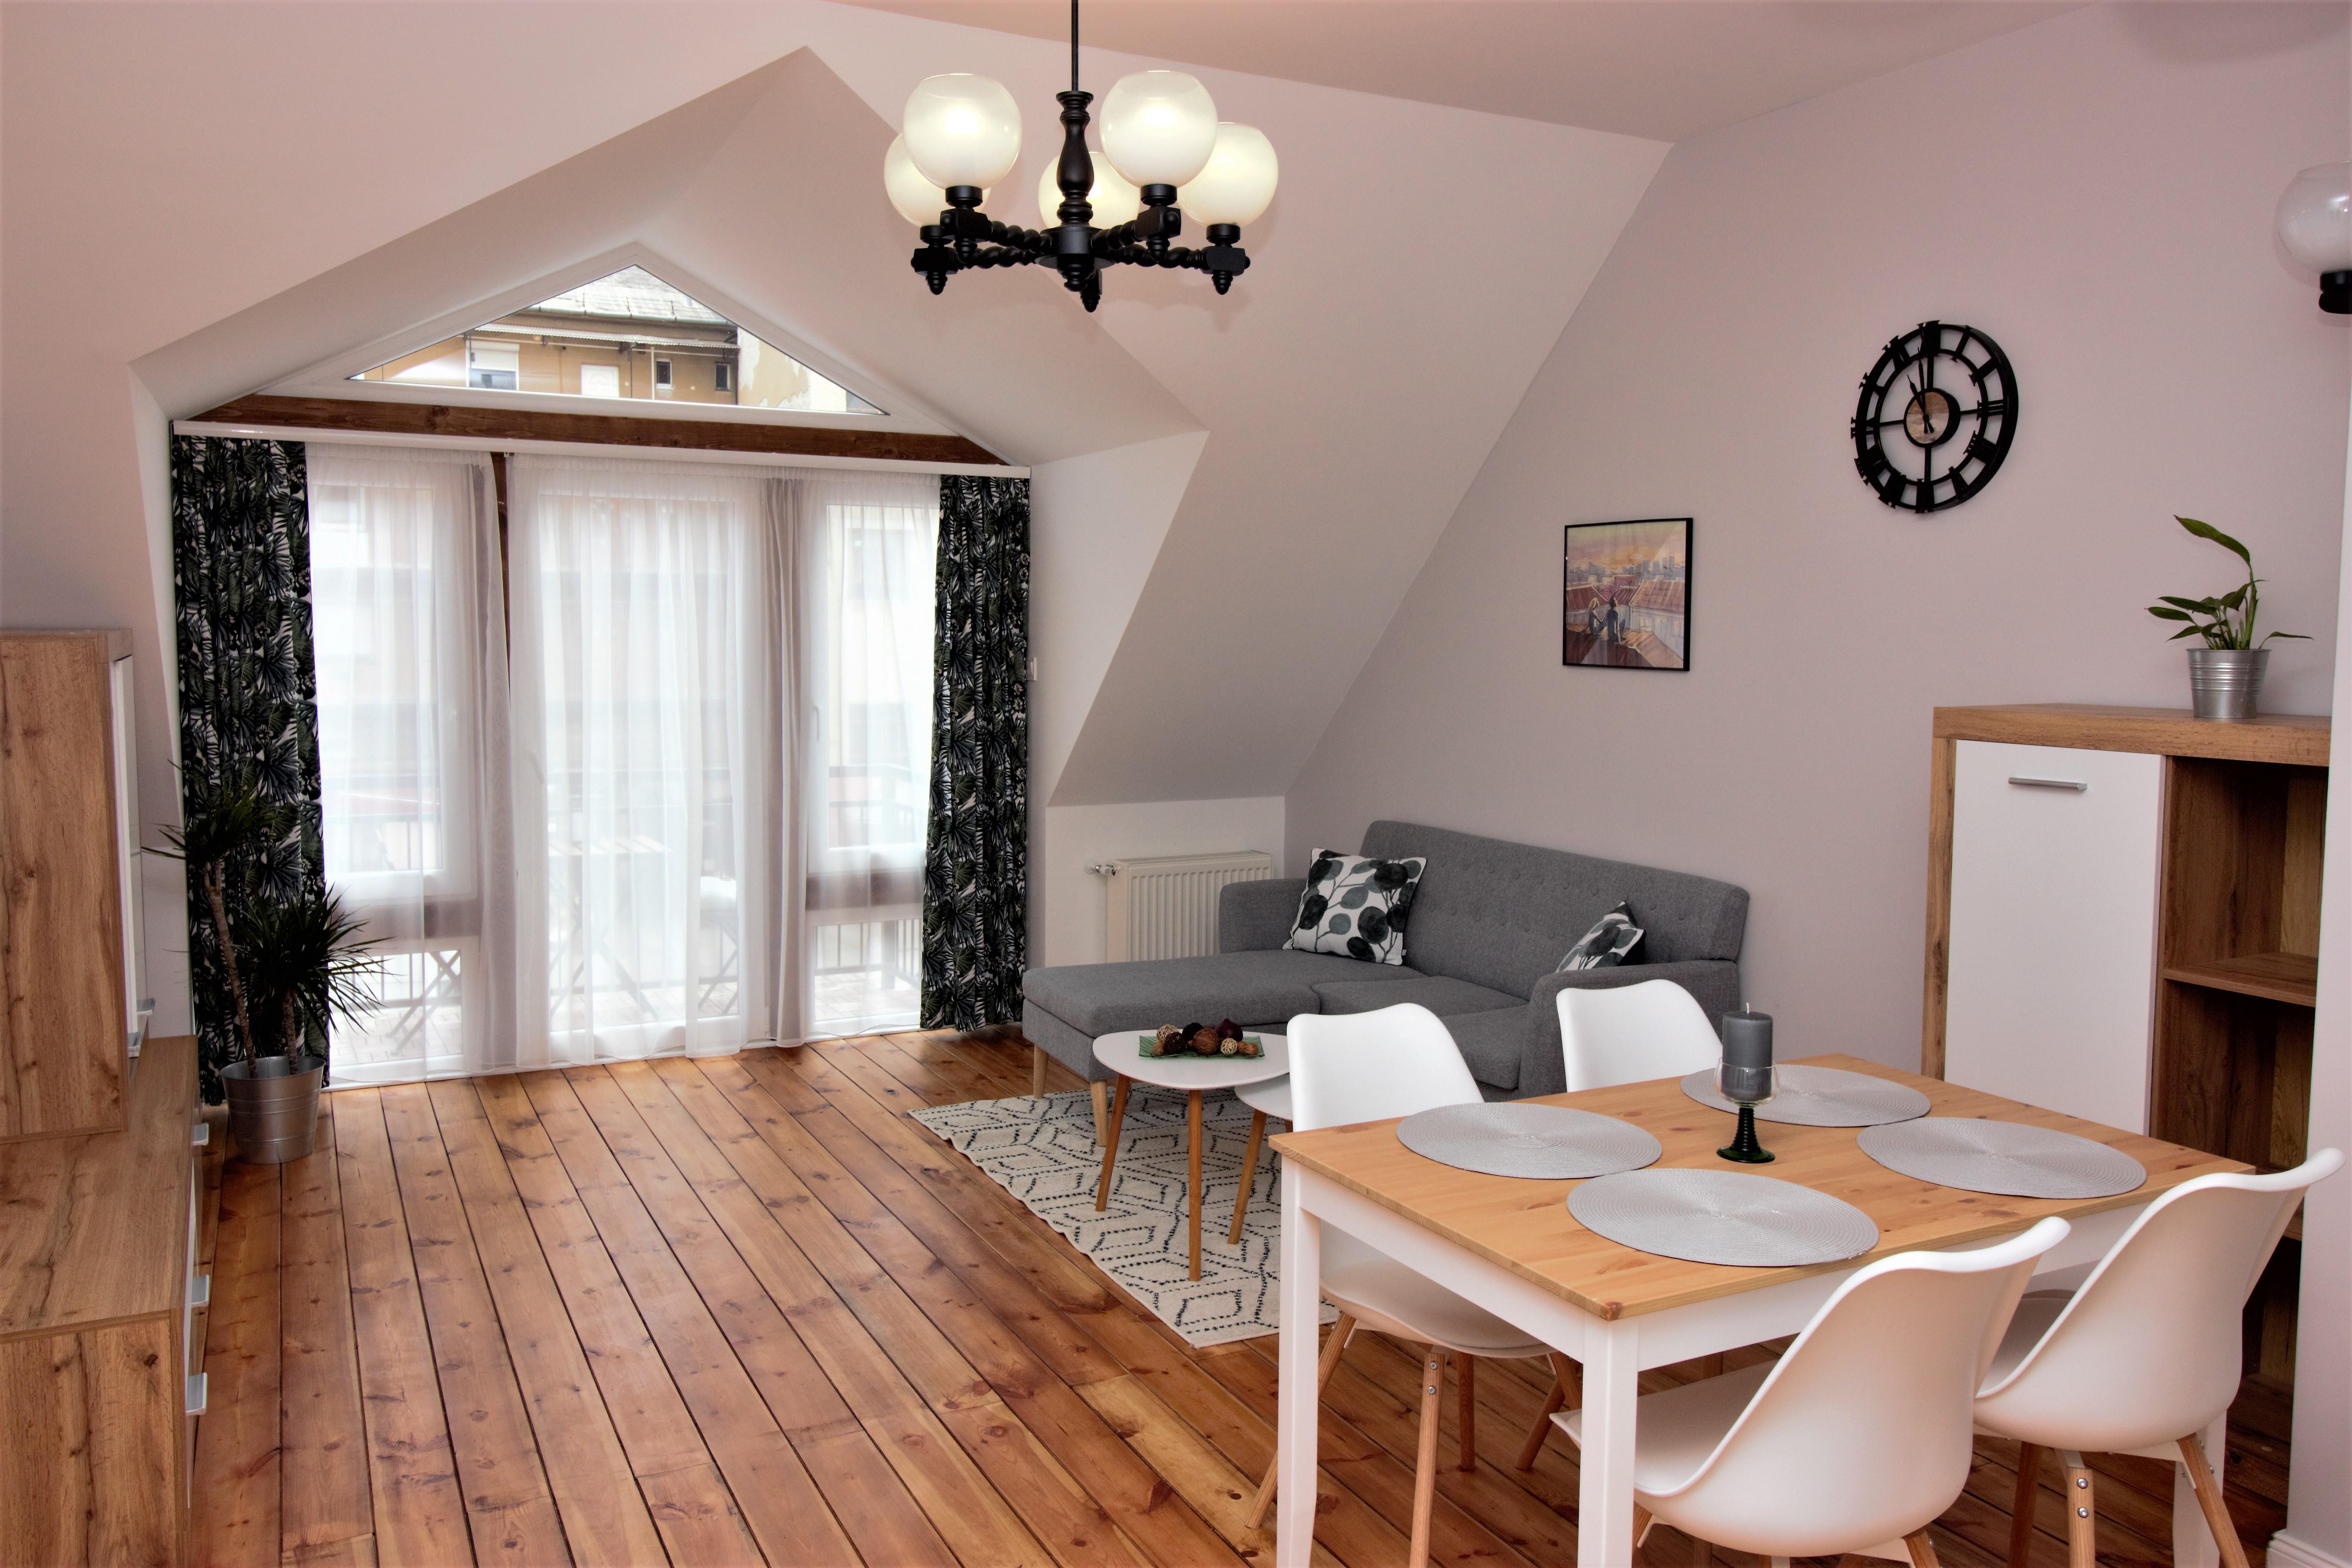 Nagy Lajos király úti ingatlan, 74 m² + 5 m² +2 m² terasz – Lakás